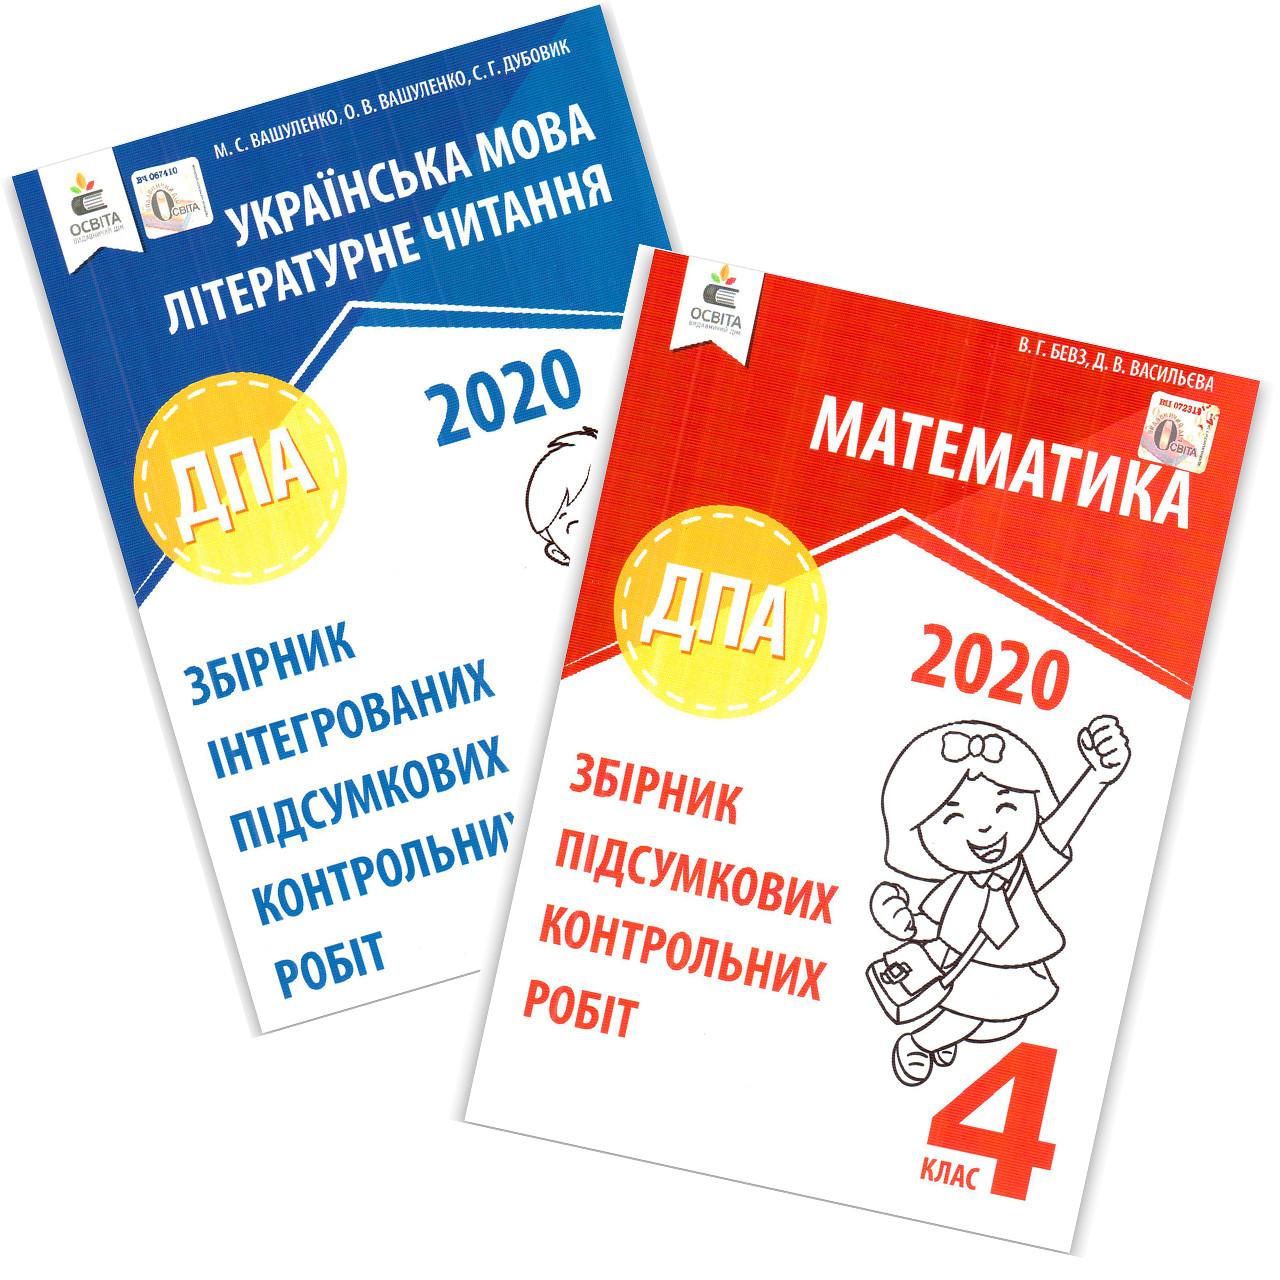 ДПА 4 клас 2020 Комплект Математика Українська мова Авт: Вашуленко М. Бевз В. Вид: Освіта